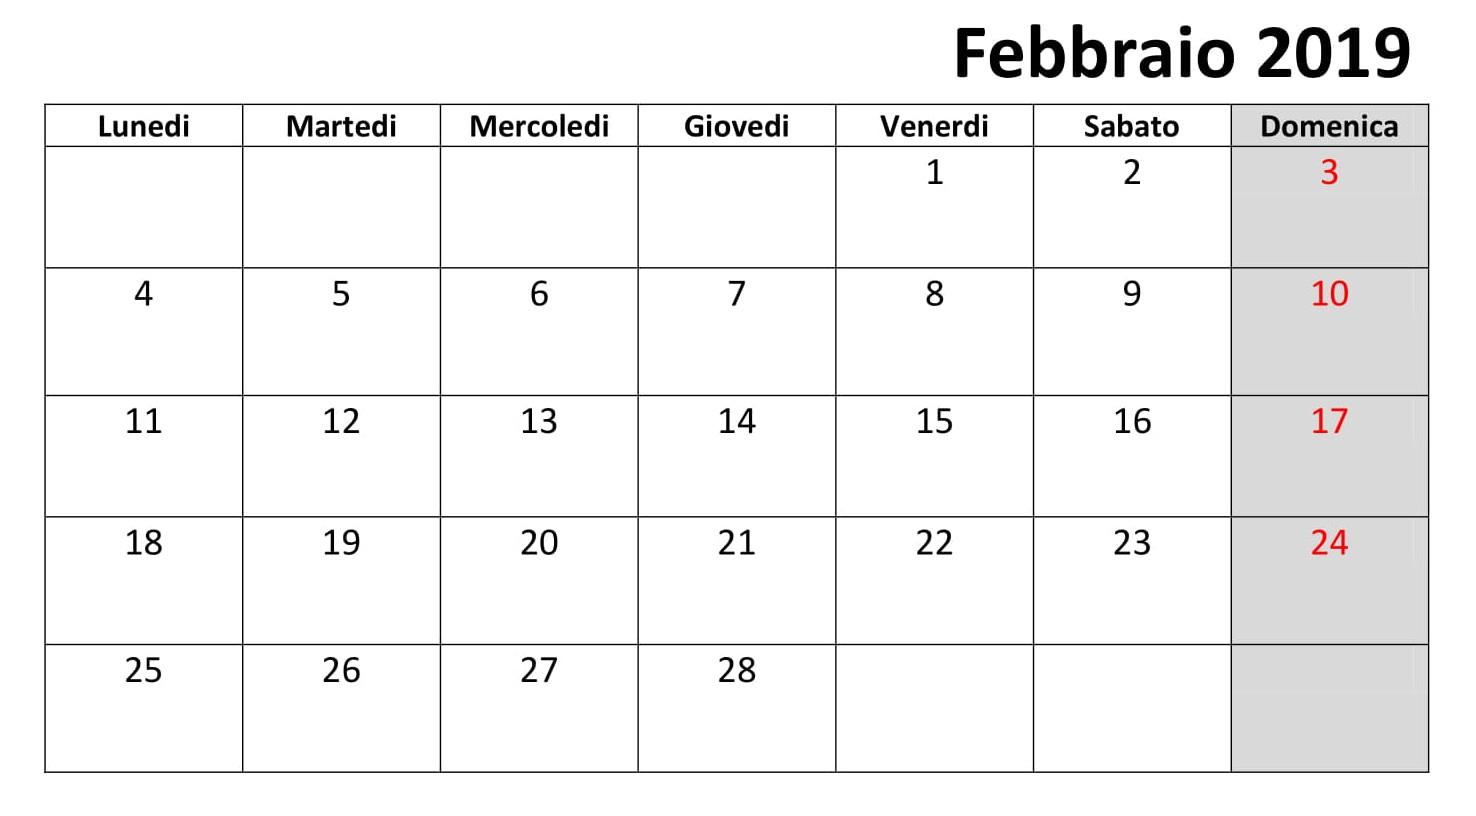 Calendario Febbraio 2019 PDF Gratuito